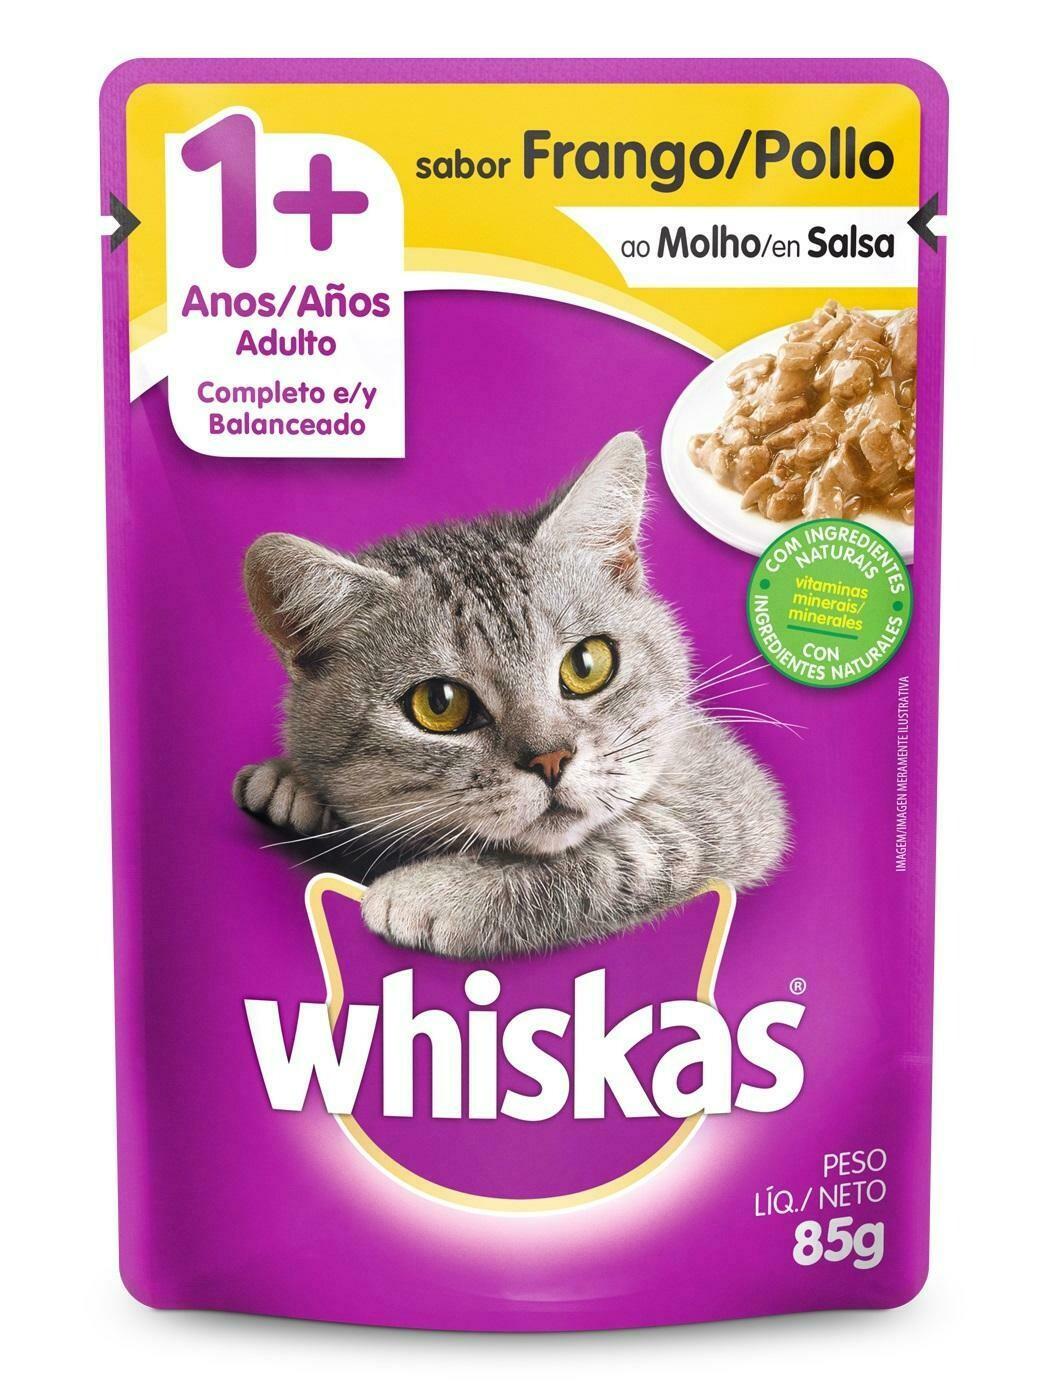 Wishkas alimento húmedo / 1 año y mas - Pollo 85g